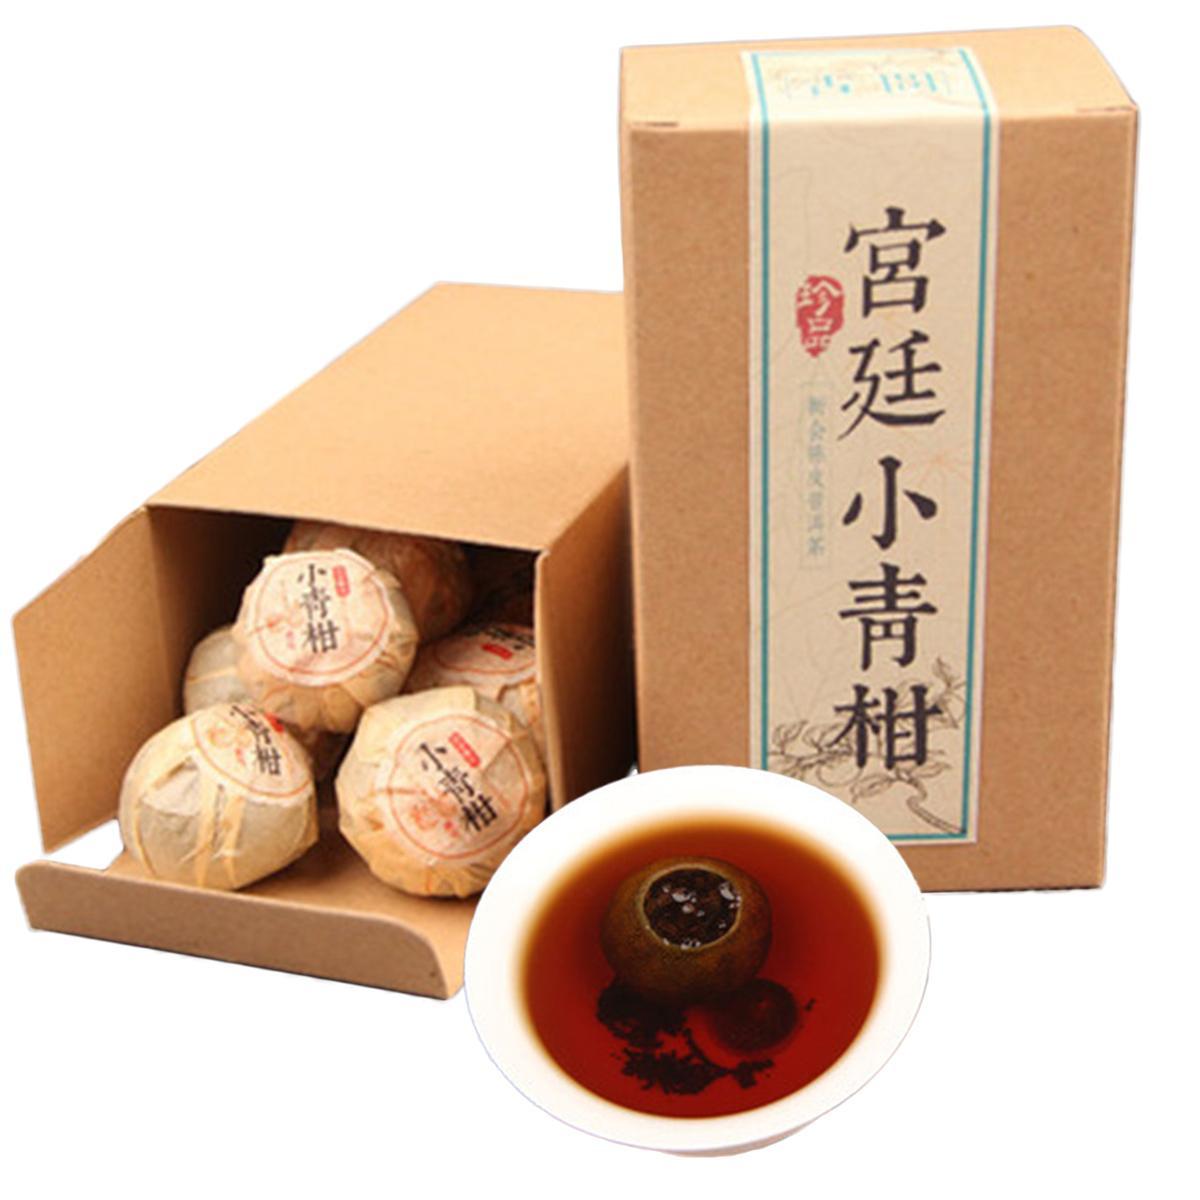 100g Yunnan Ripe Puer Tea Cake Palace Small Green Mandarin Organic Natural Pu-erh Black Tea Old Tree Cooked Puerh Tea Preferred